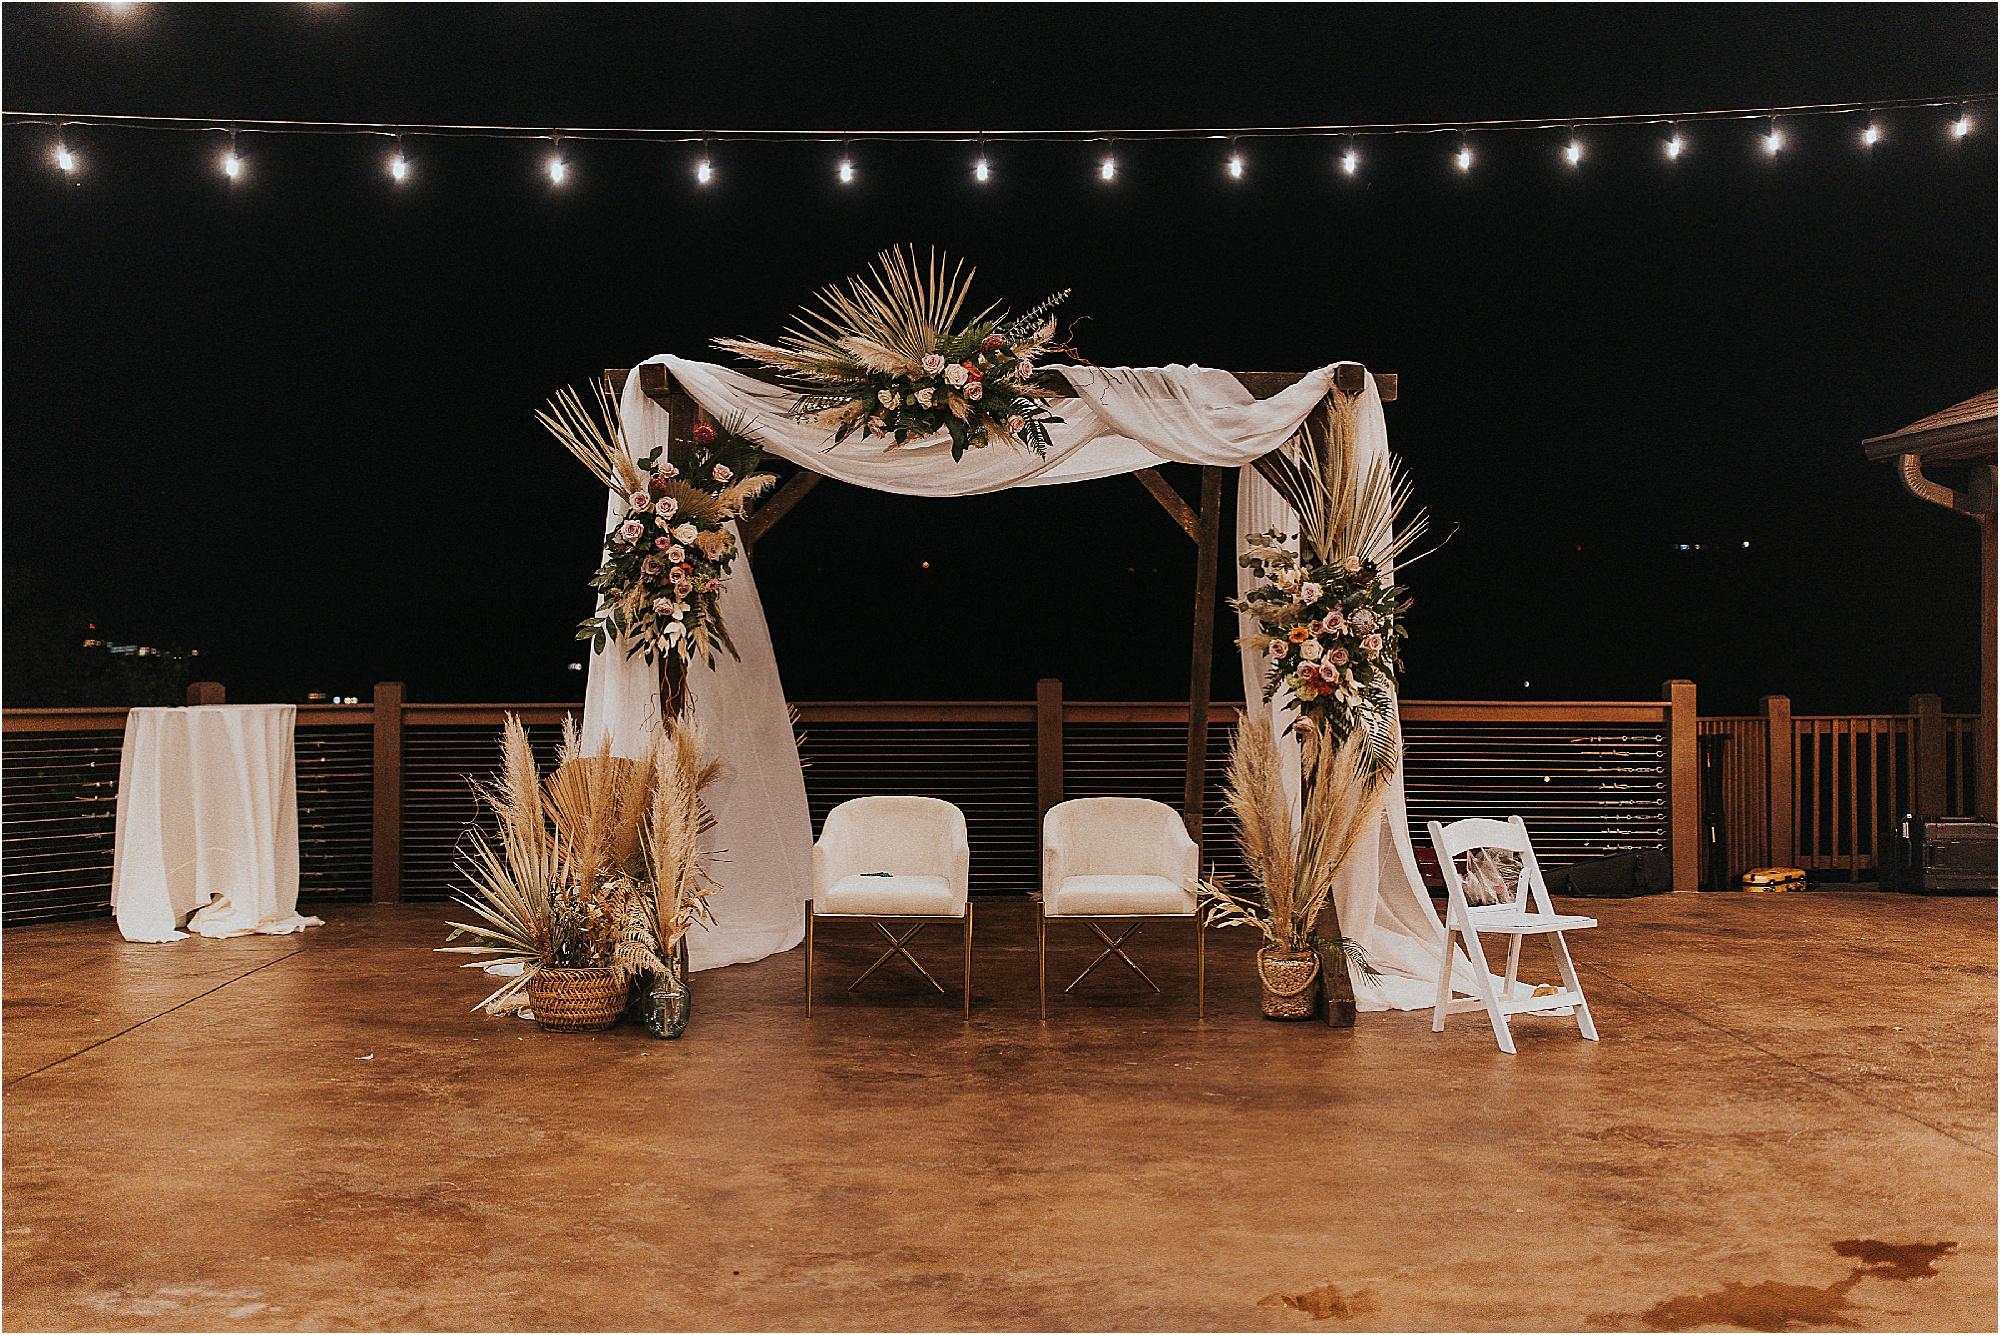 Huppah at wedding ceremony